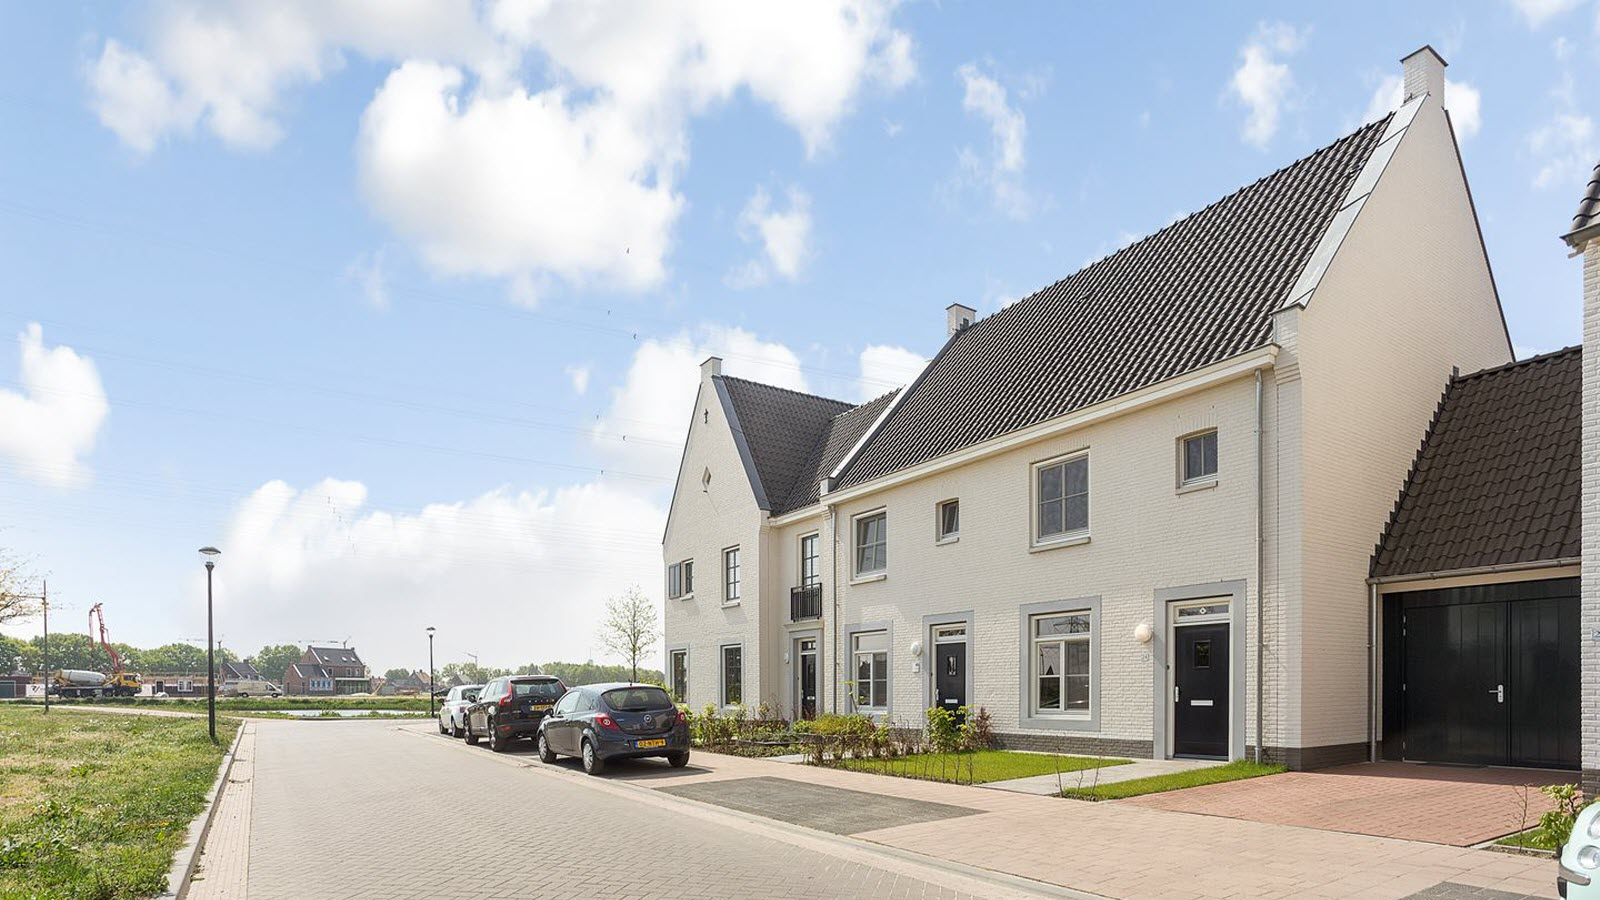 Liverdonk Helmond (3)